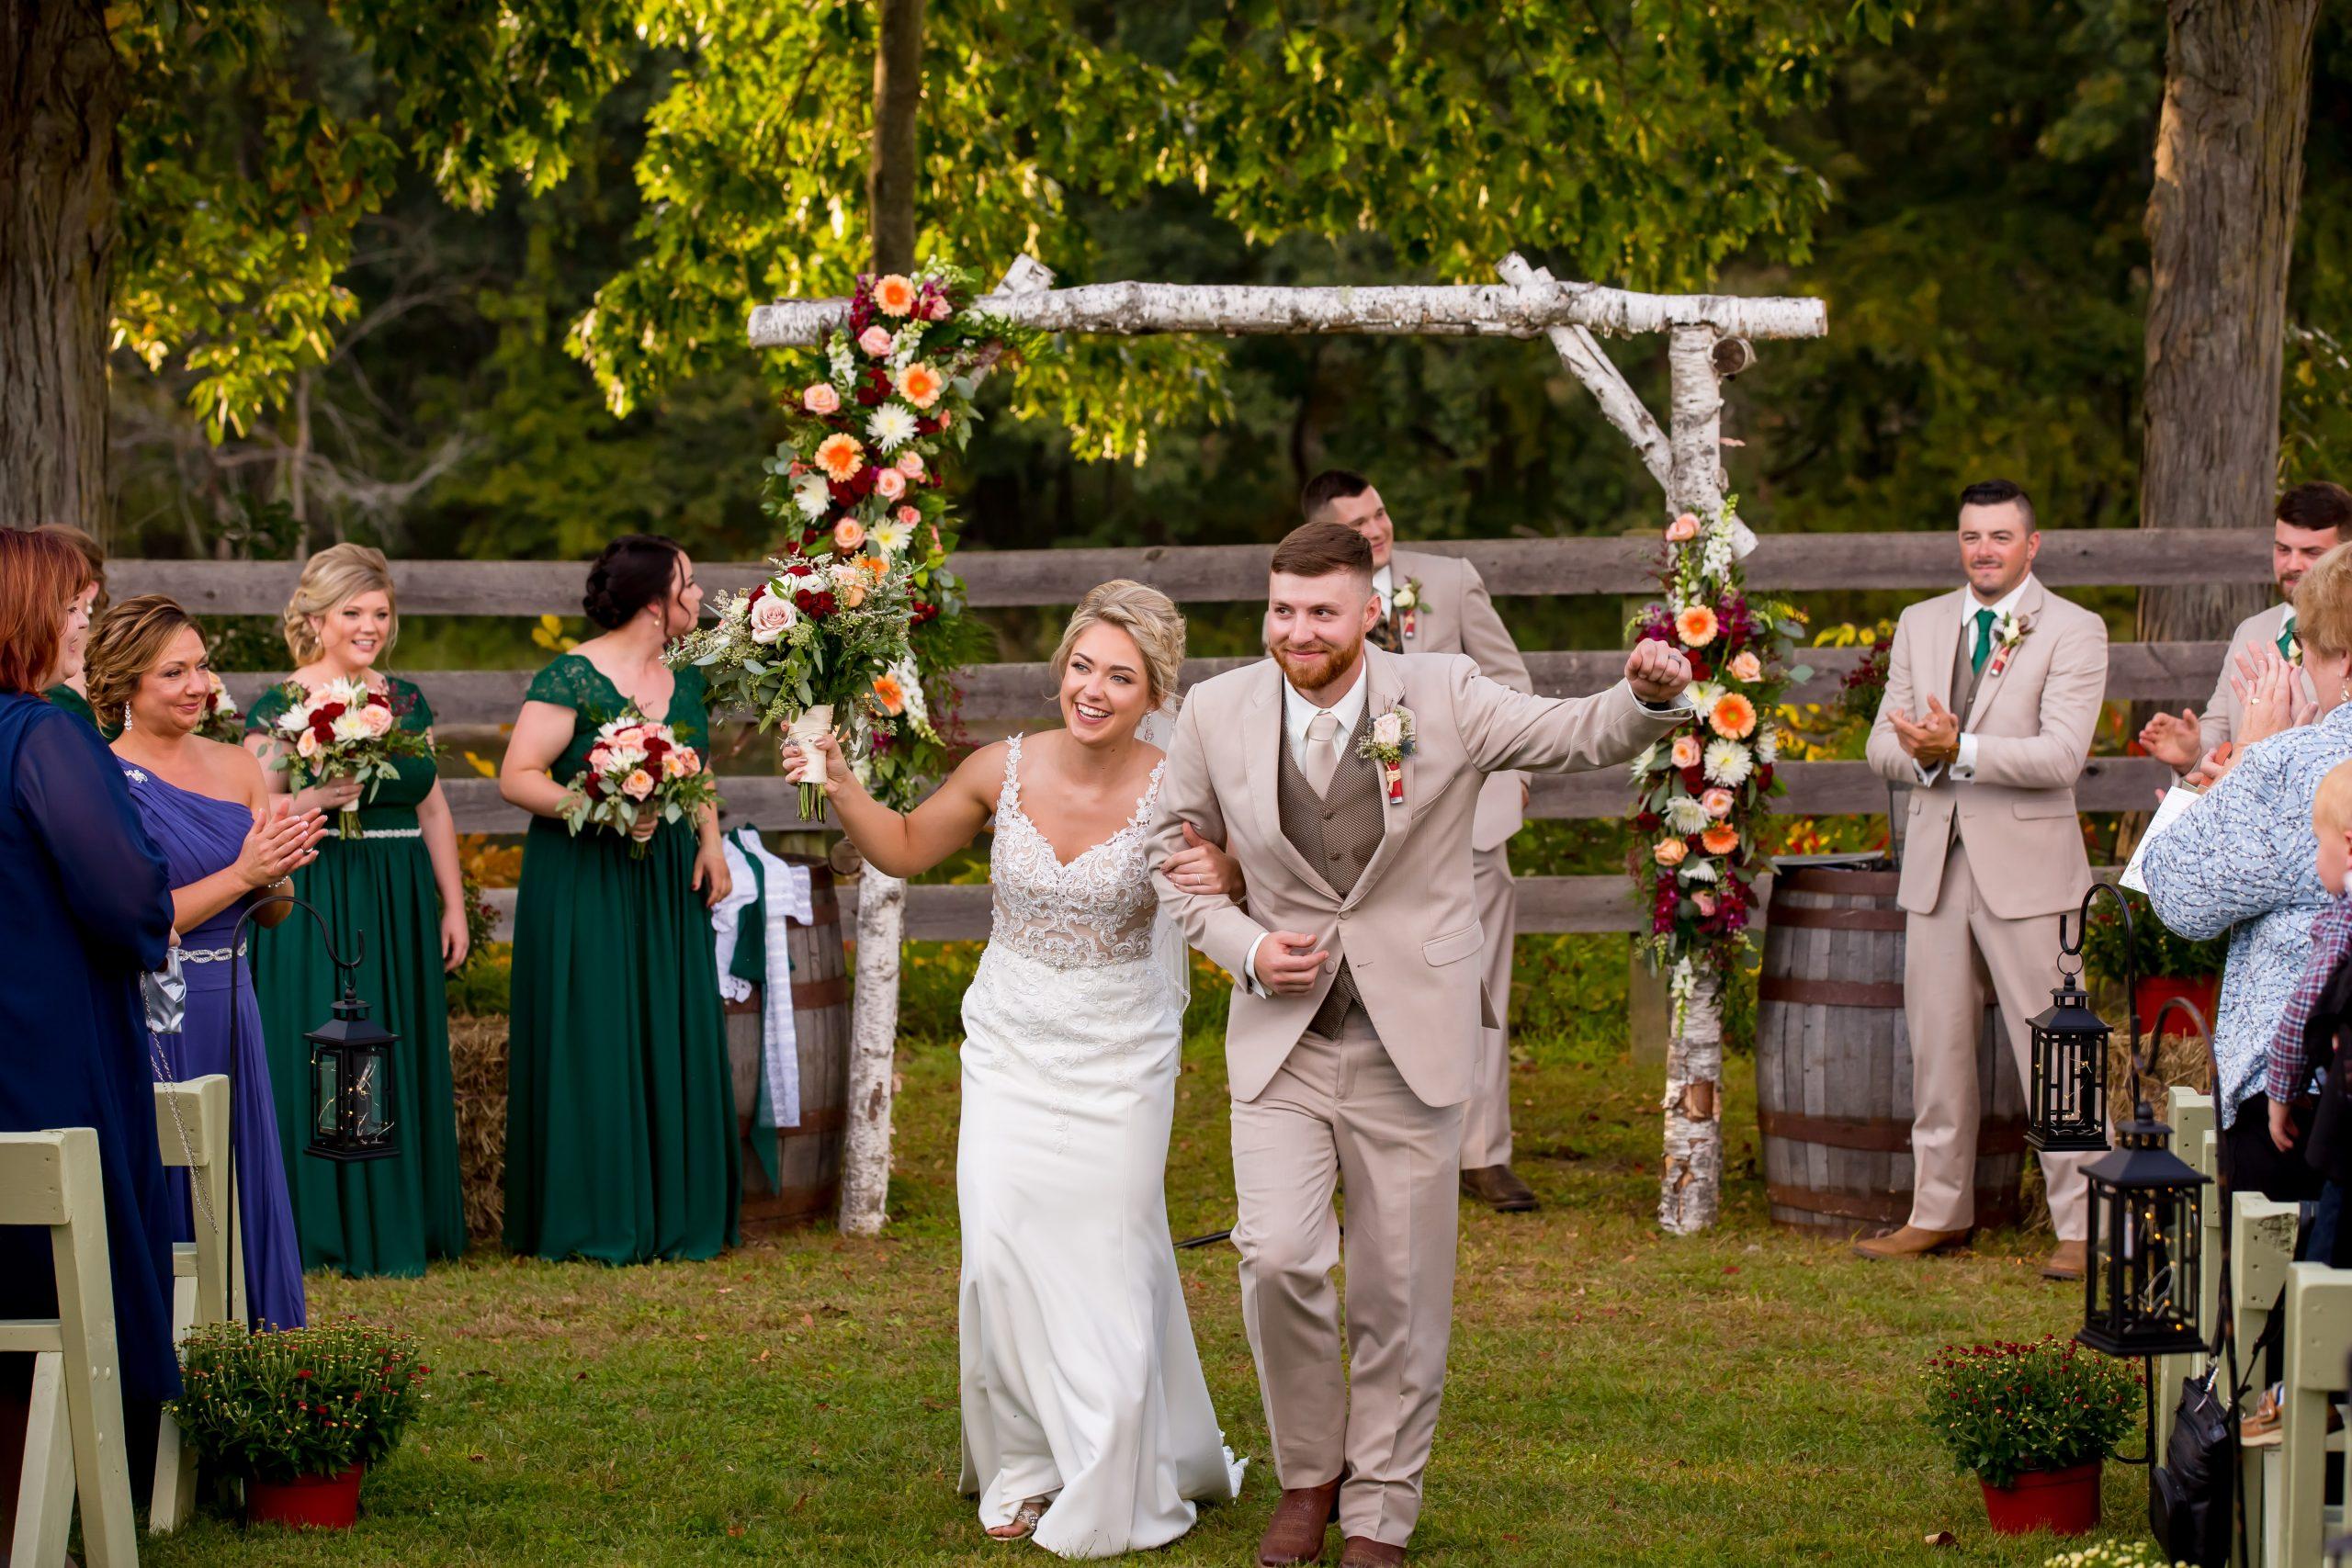 liberty_ridge_wedding15.jpg